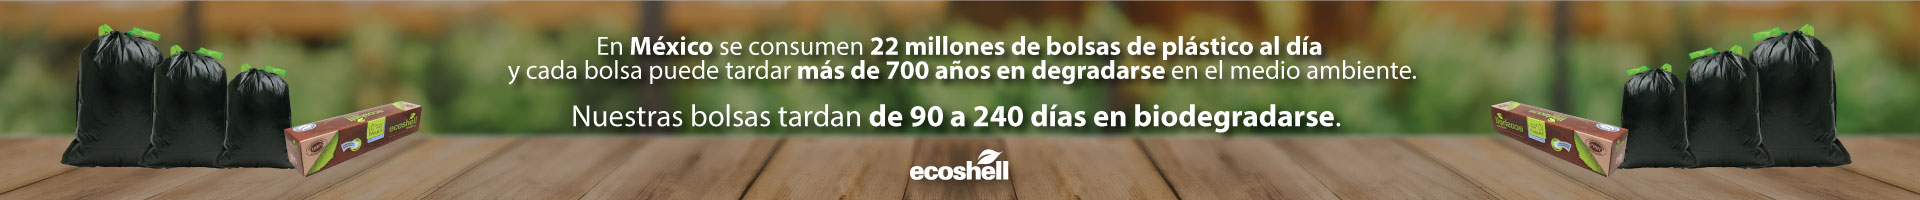 Ecoshell - Expertos en Desechables Biodegradables